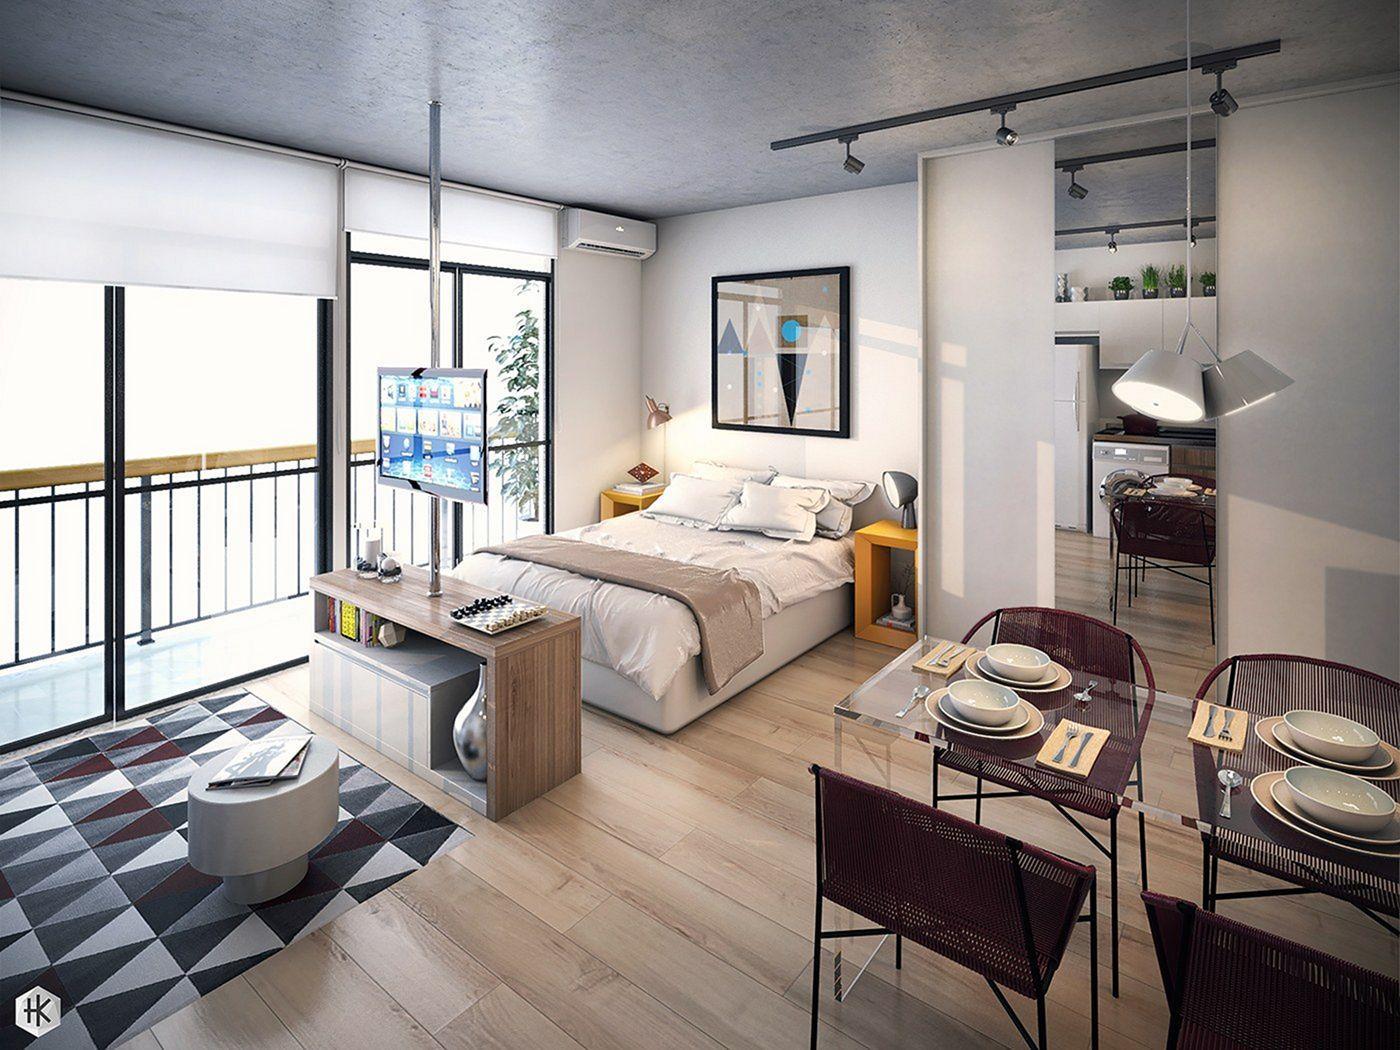 дизайн квартиры зал